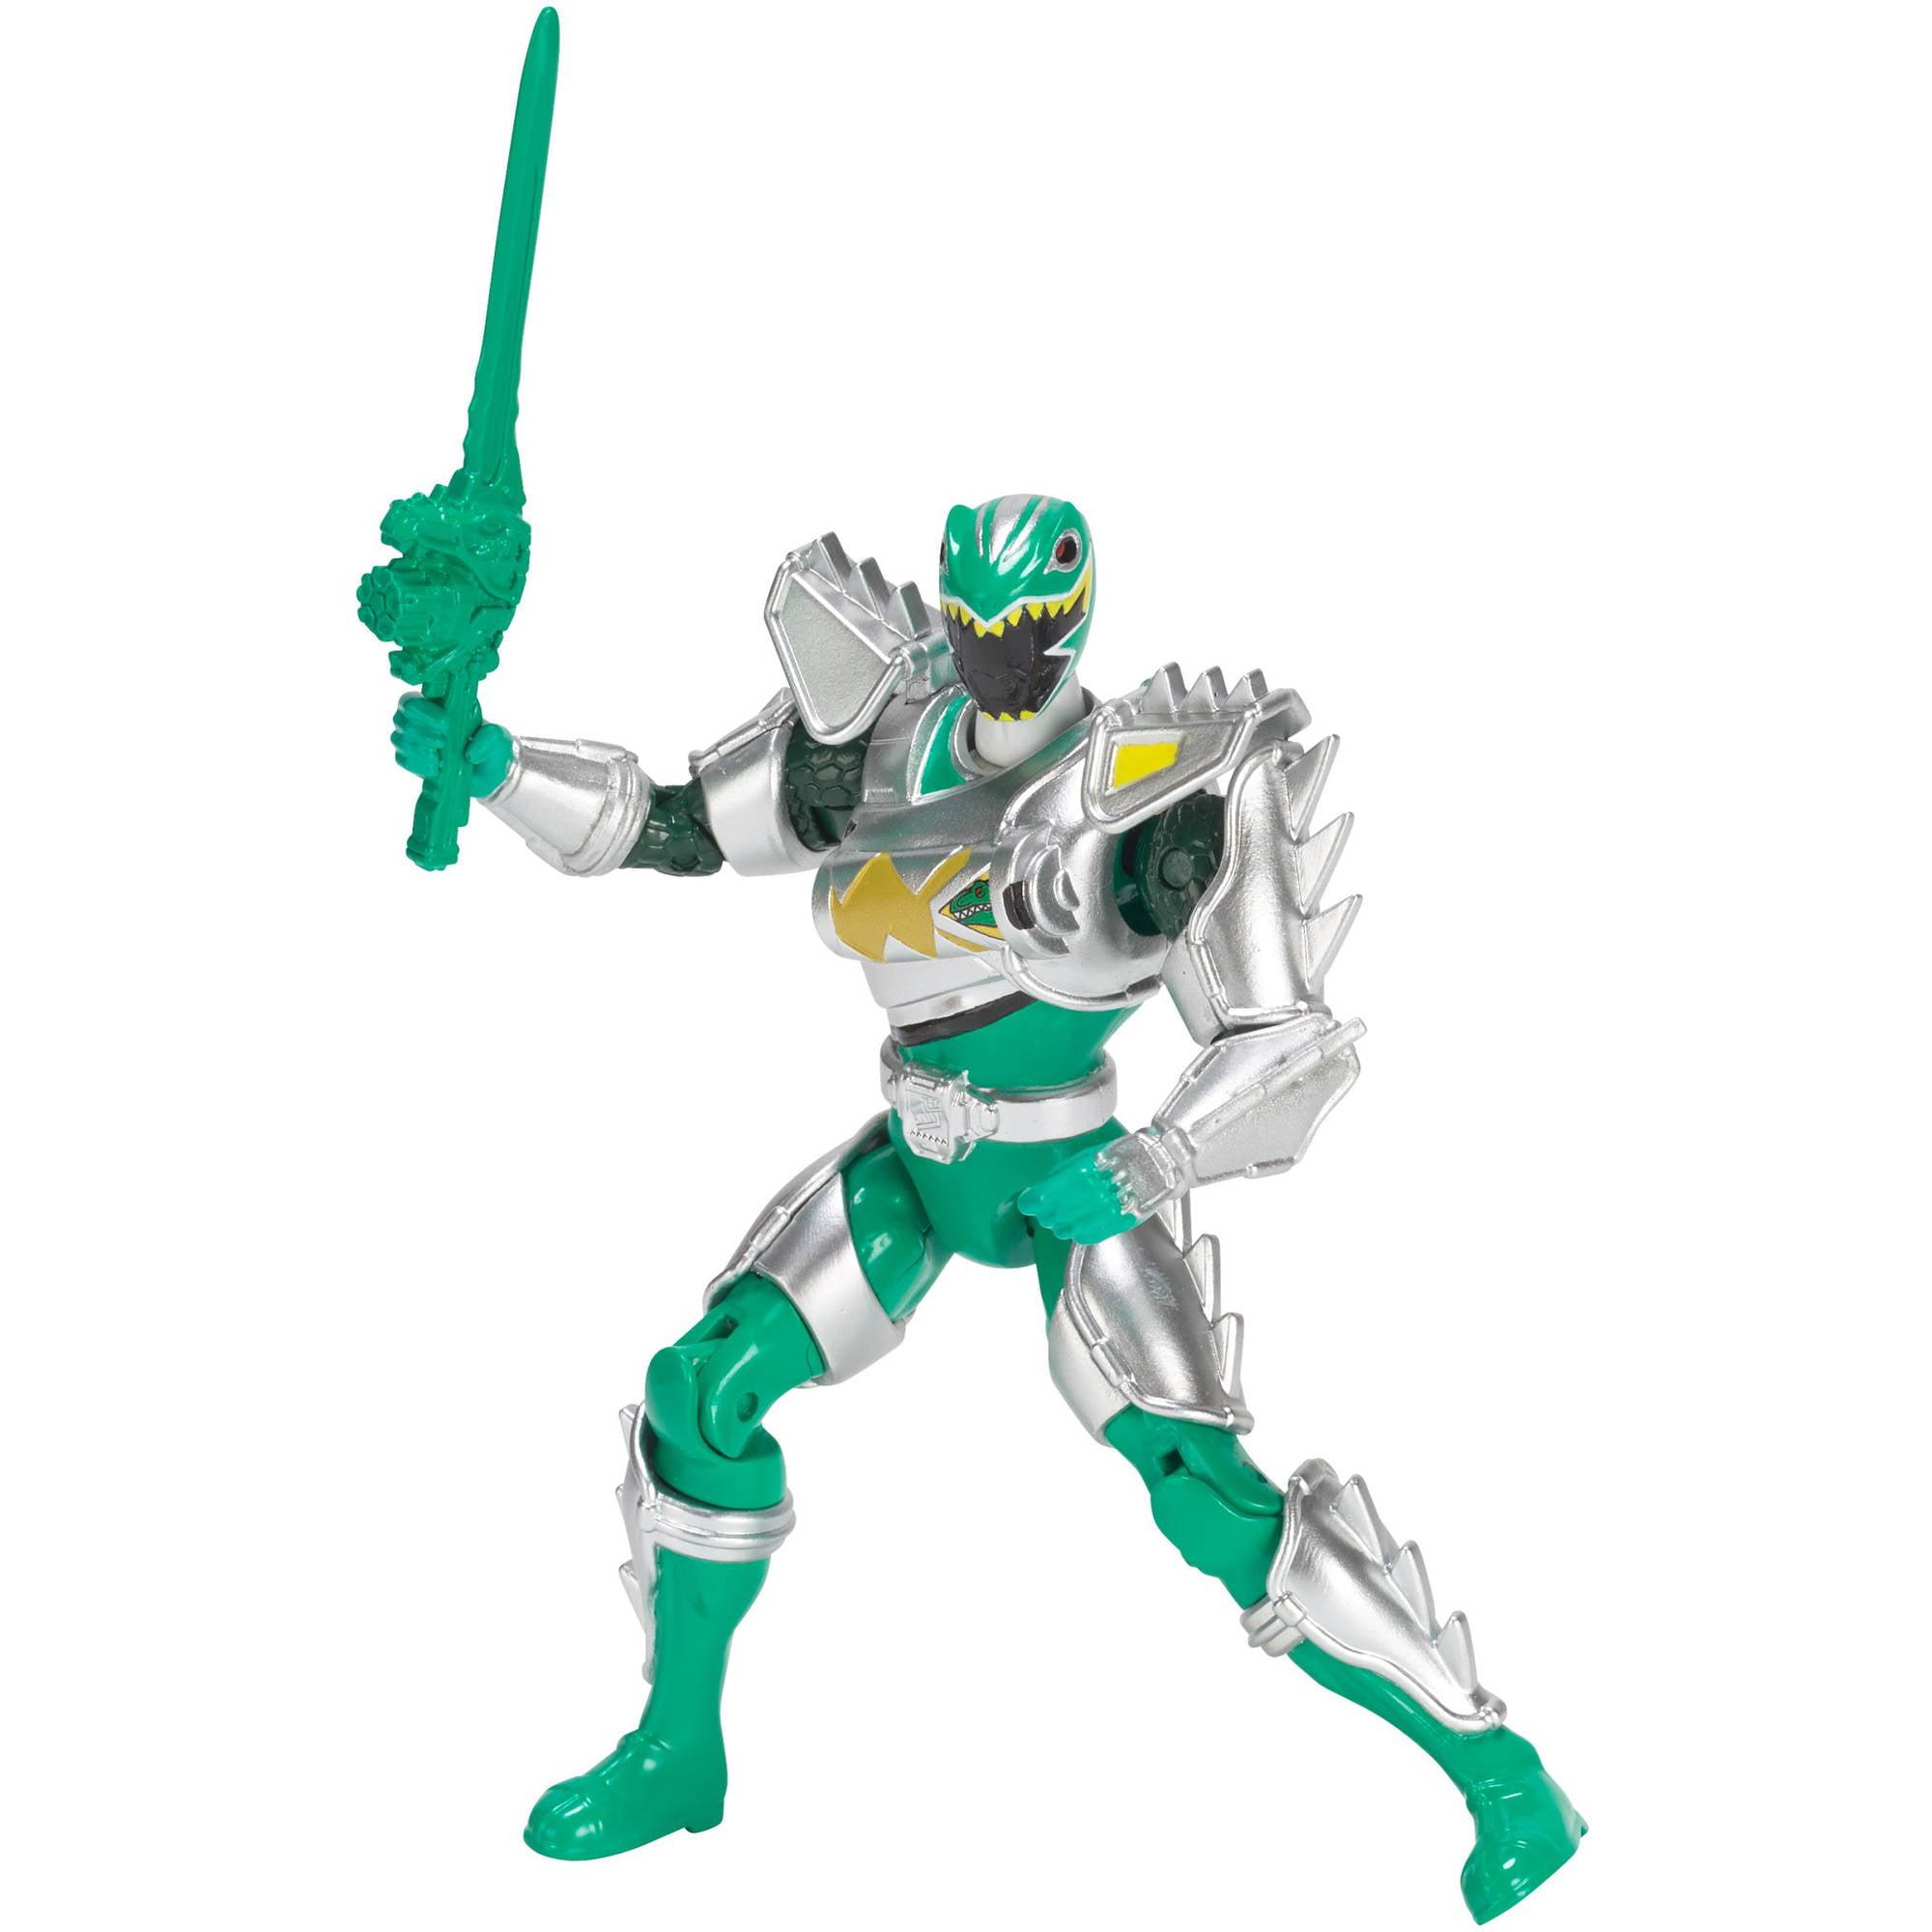 - Power Rangers Dino Super Charge Dino Super Drive Green Ranger